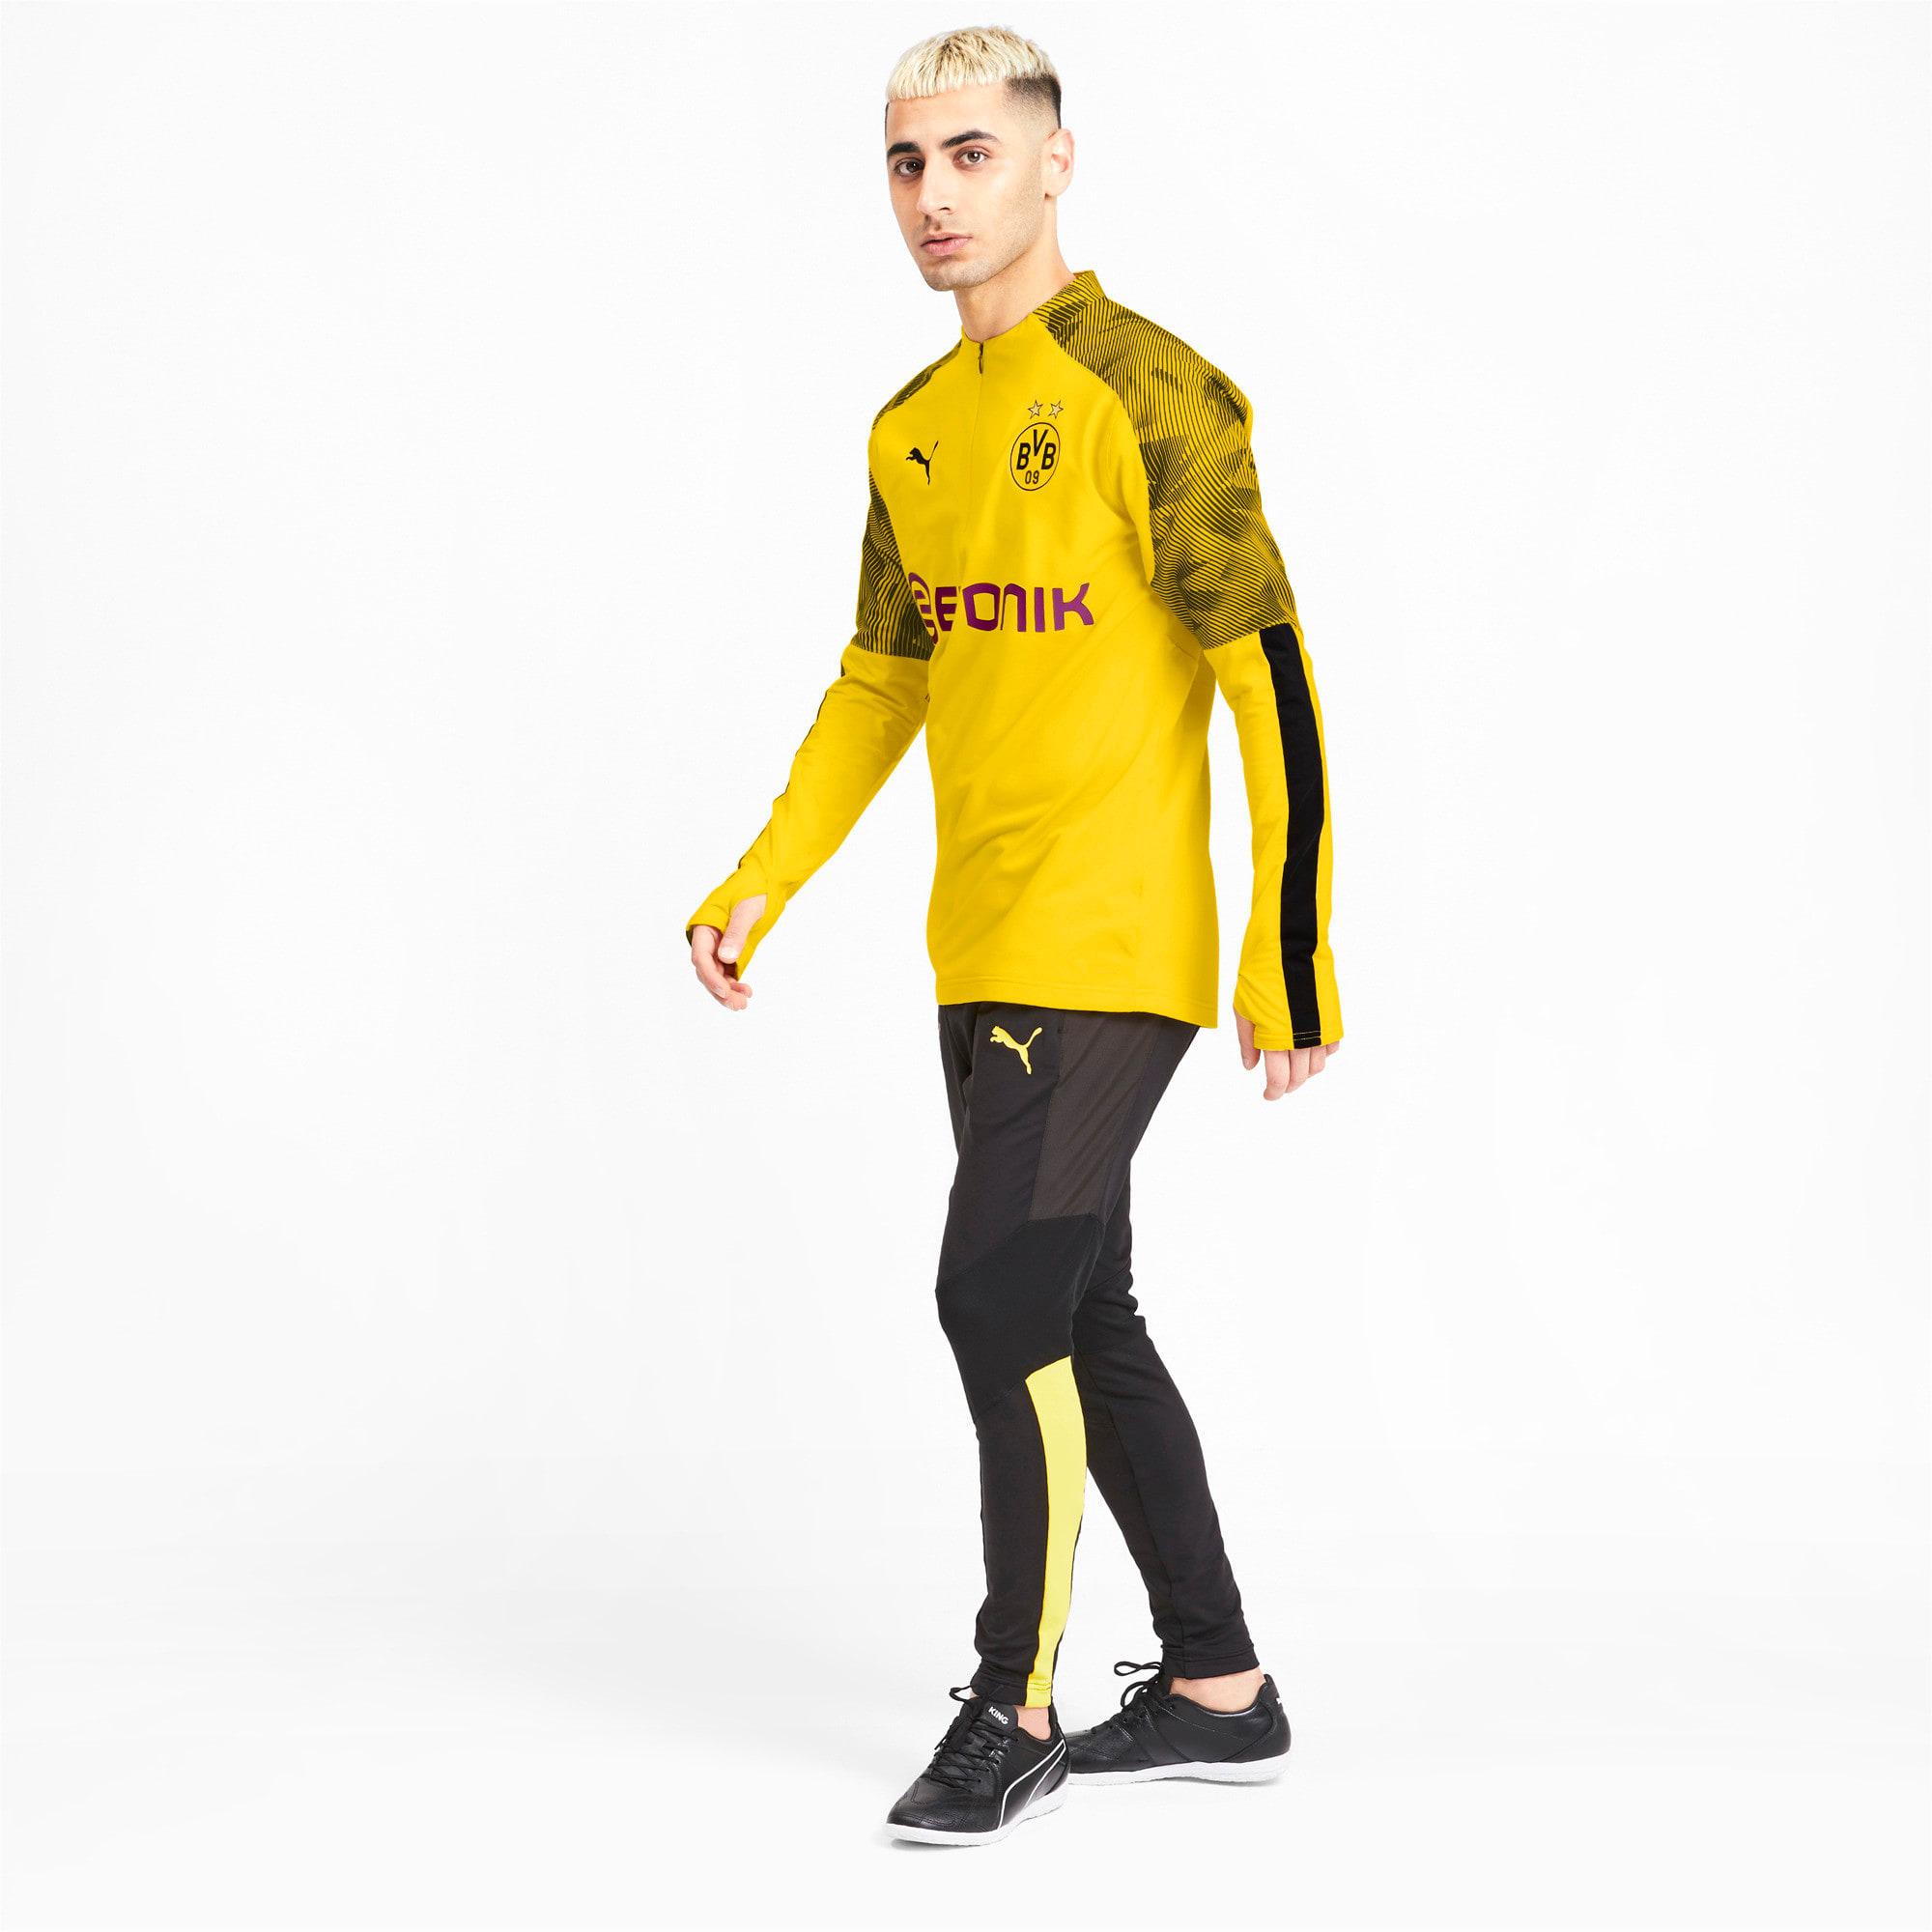 Thumbnail 3 of BVB Men's 1/4 Zip Training Top, Cyber Yellow-Puma Black, medium